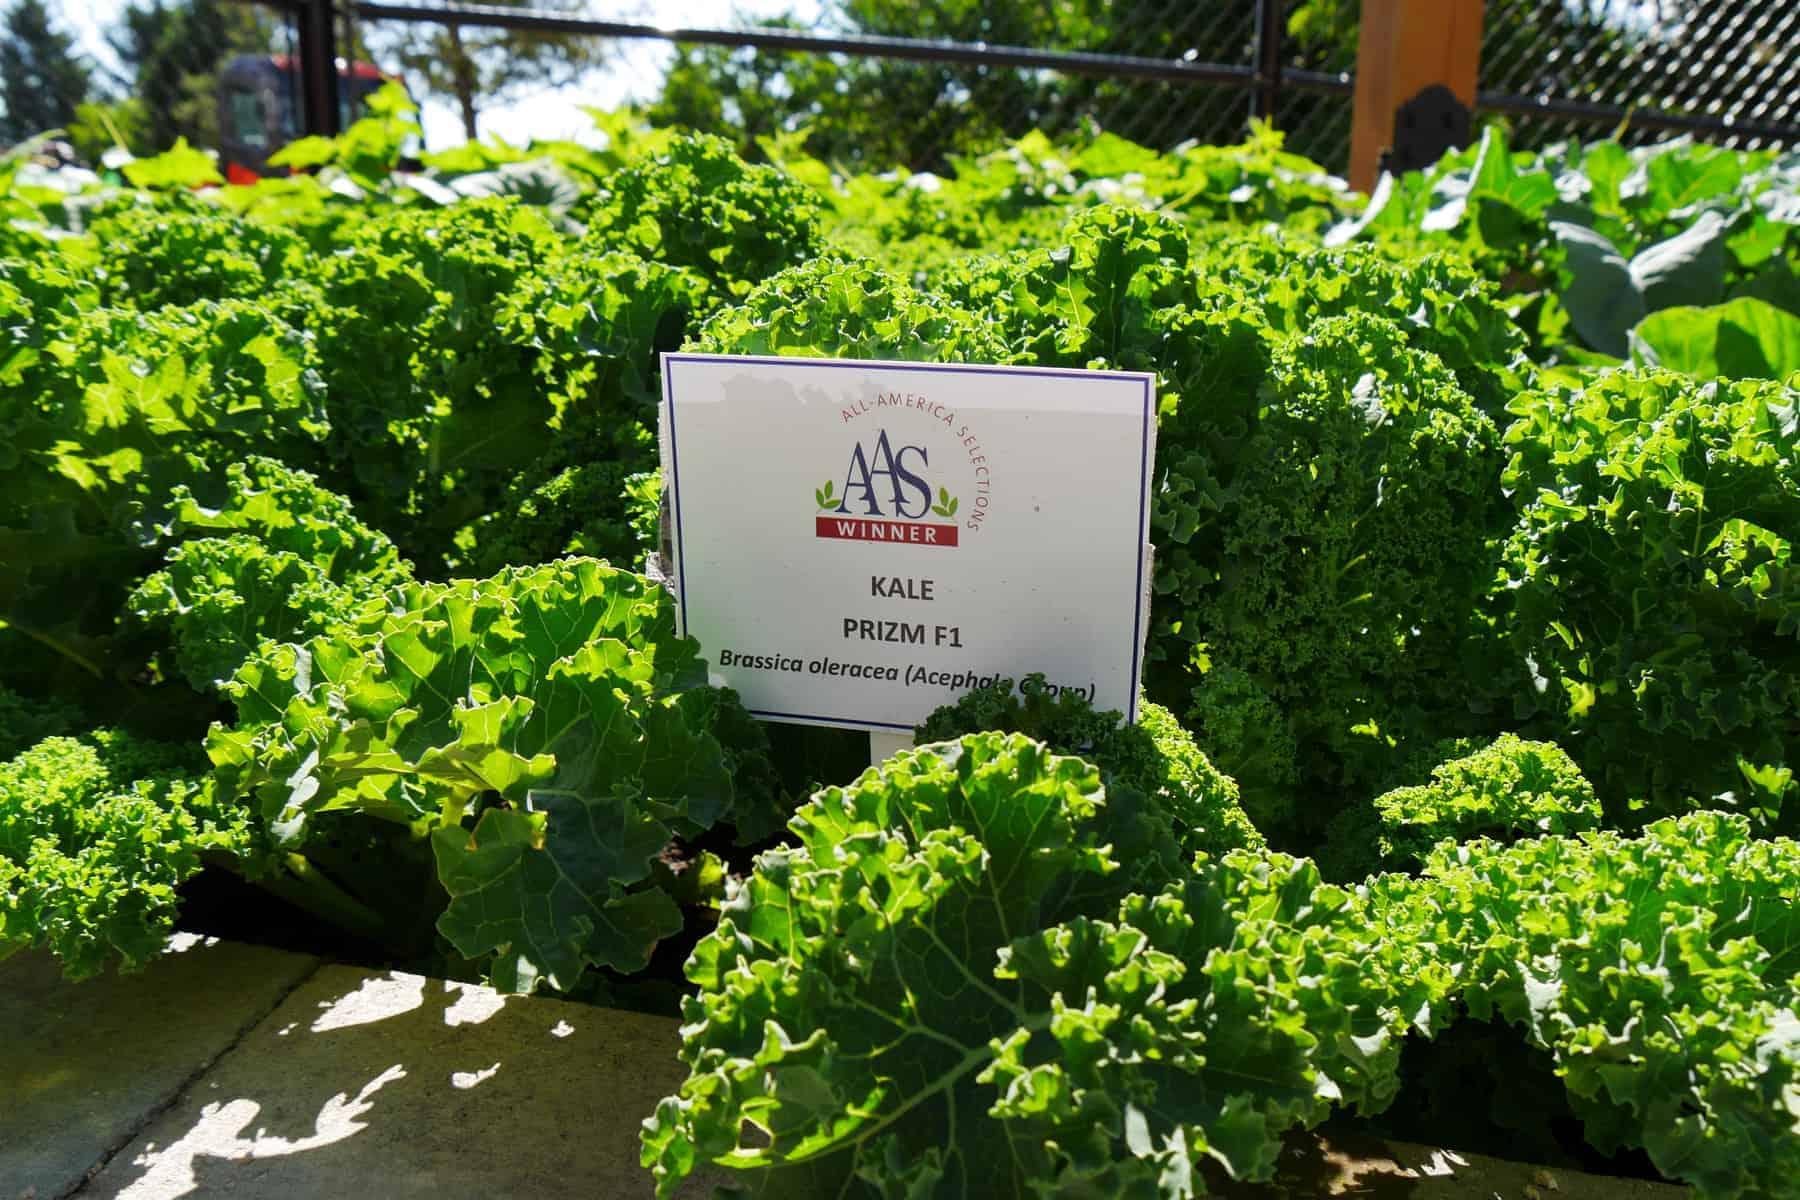 Kale Prizm at Humber Arboretum, Toronto - AAS Display Garden